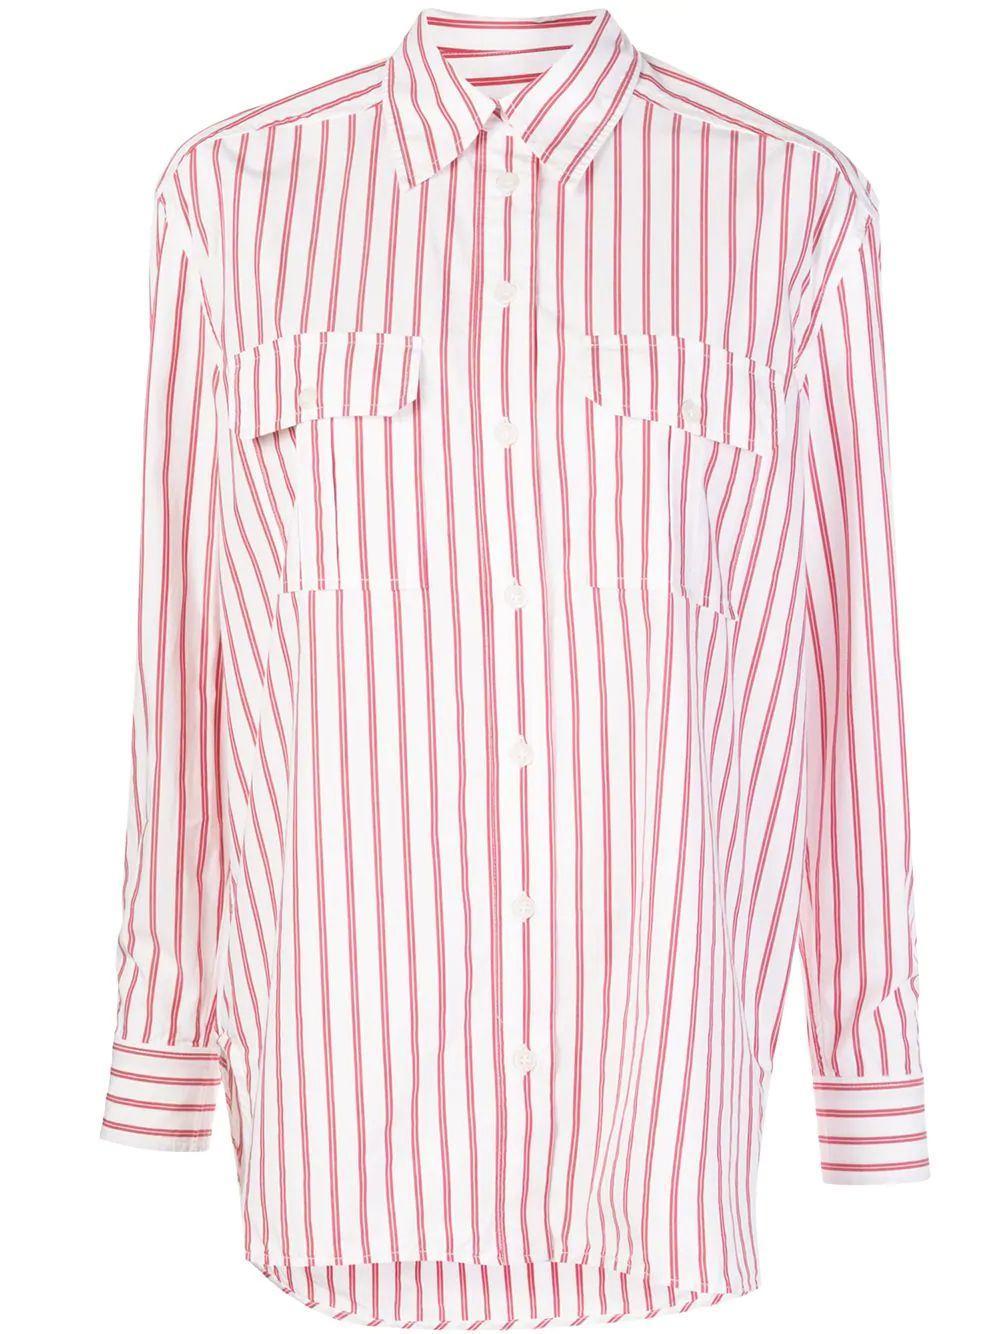 Stripe Cotton Buttondown Item # F4869